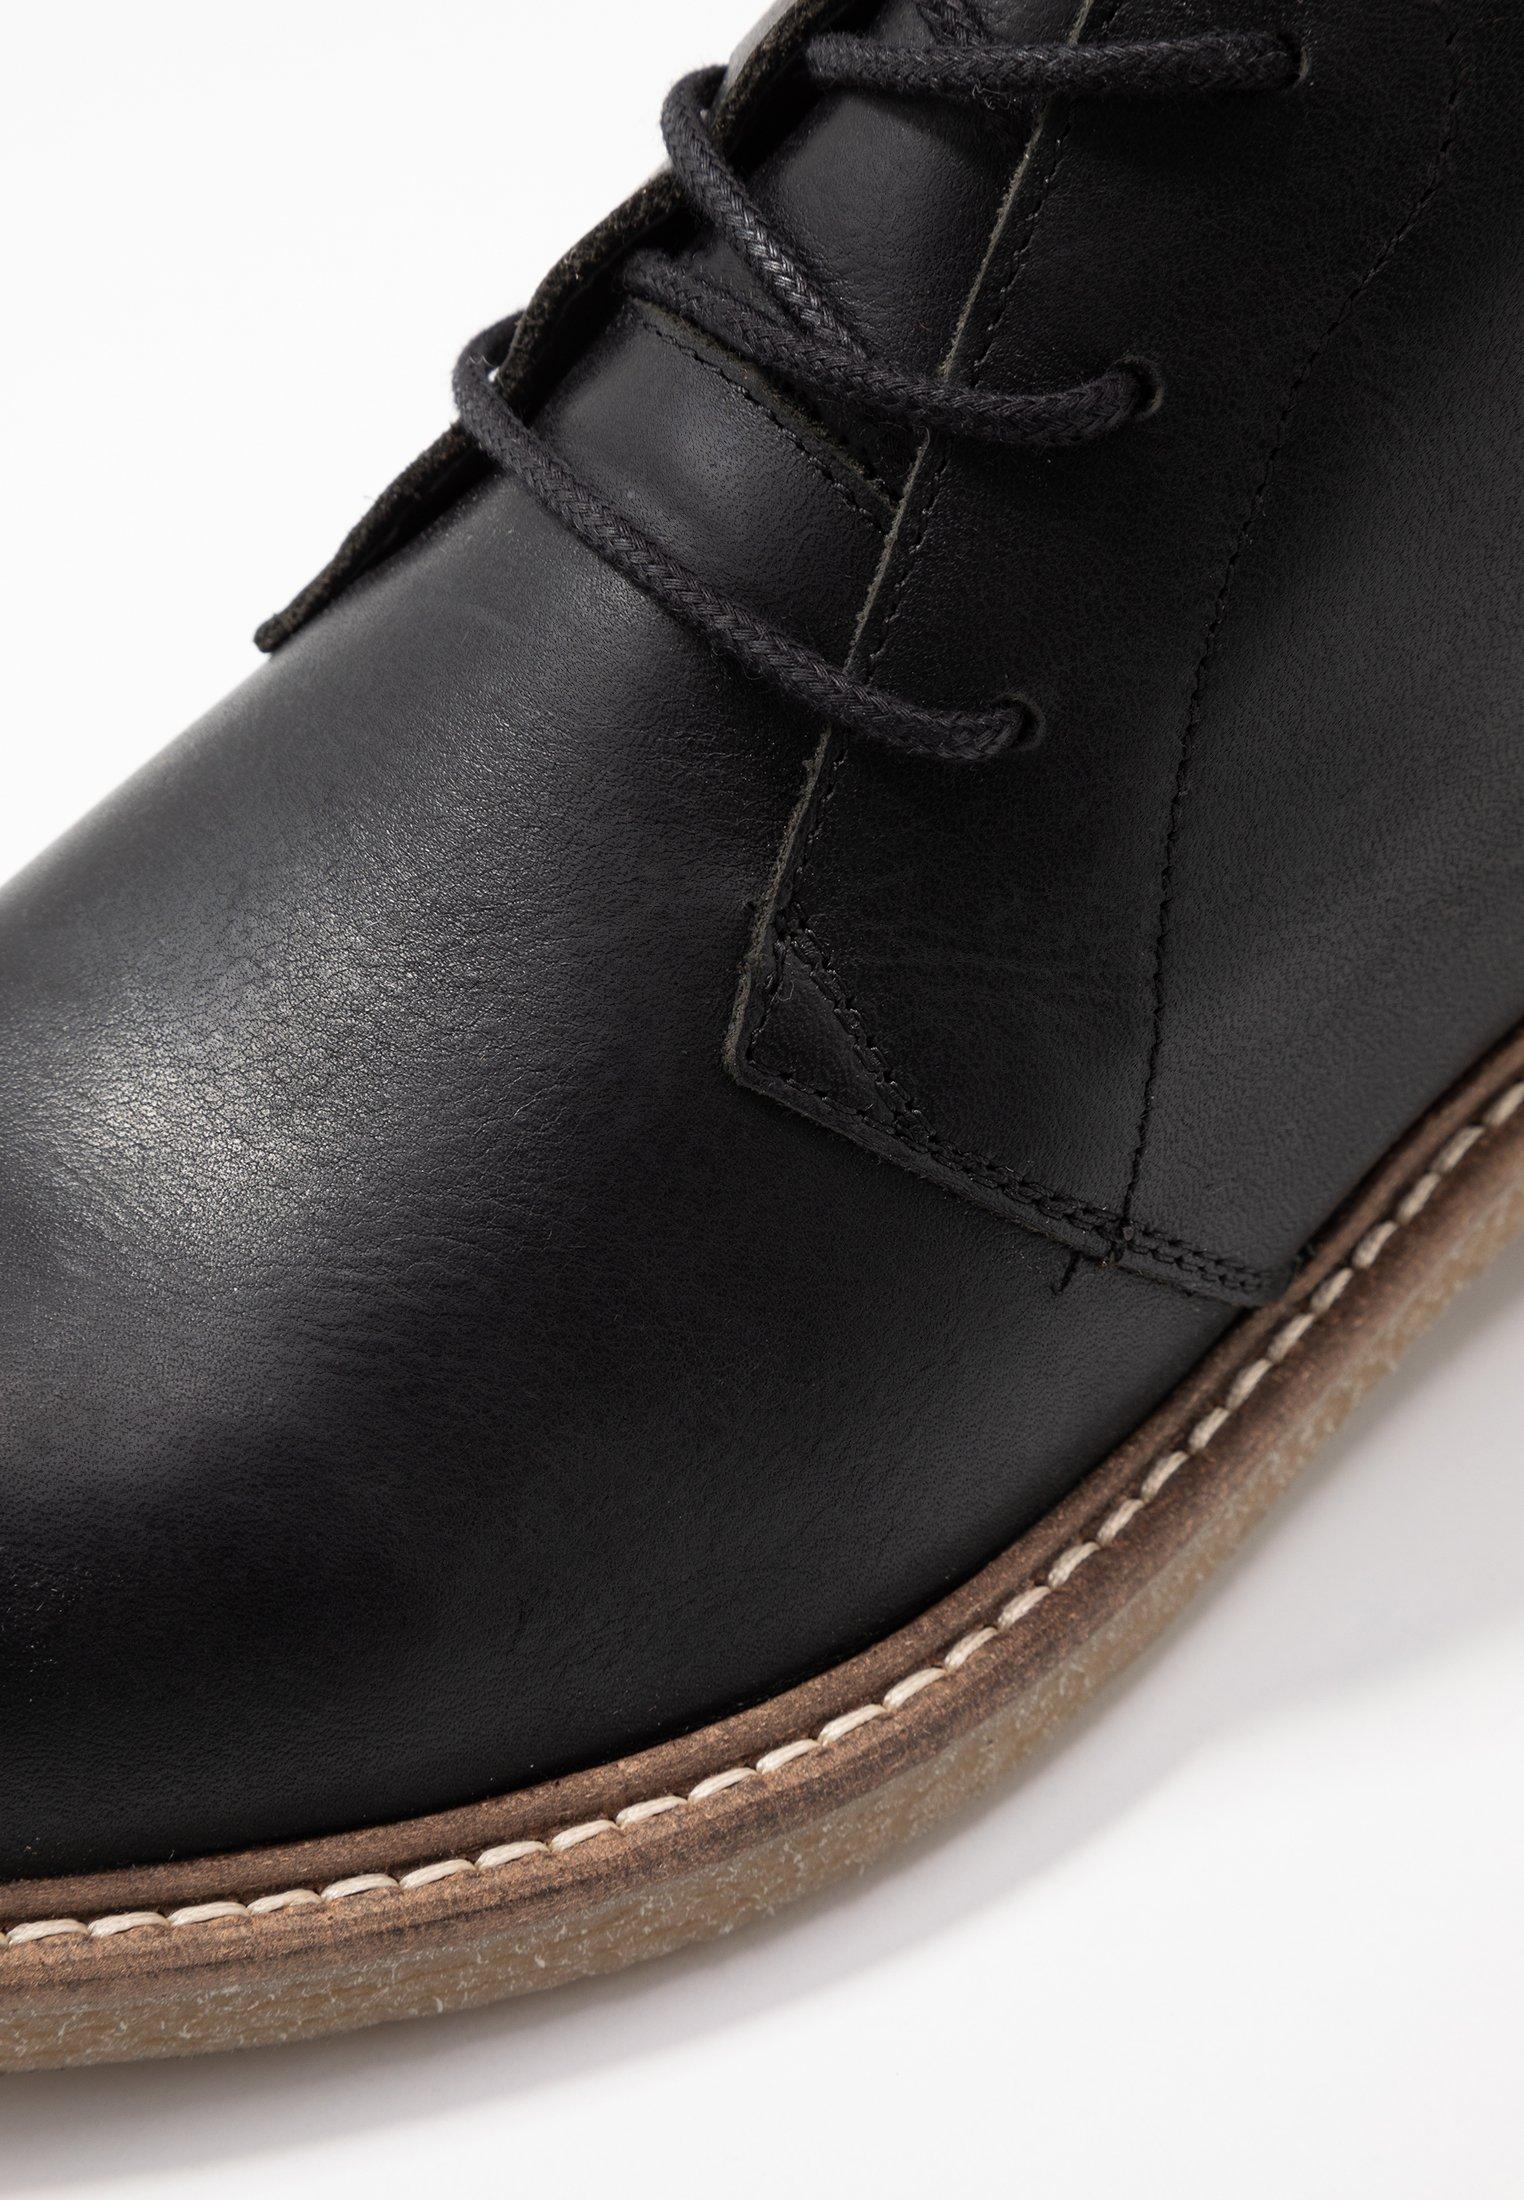 HUB TOMAR - Ankle Boot - black - Black Friday